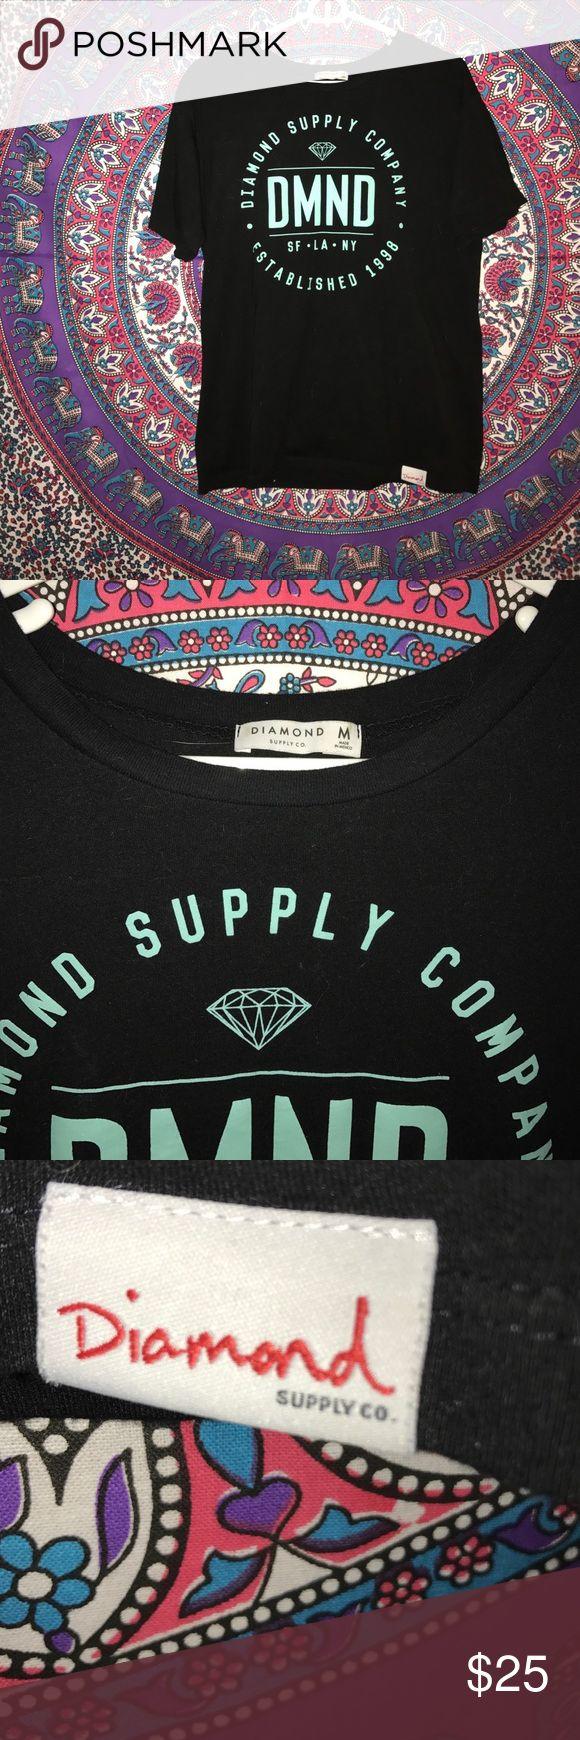 Diamond supply co. DMND supply company tee size medium brand new perfect condition nwot Diamond Supply Co. Tops Tees - Short Sleeve